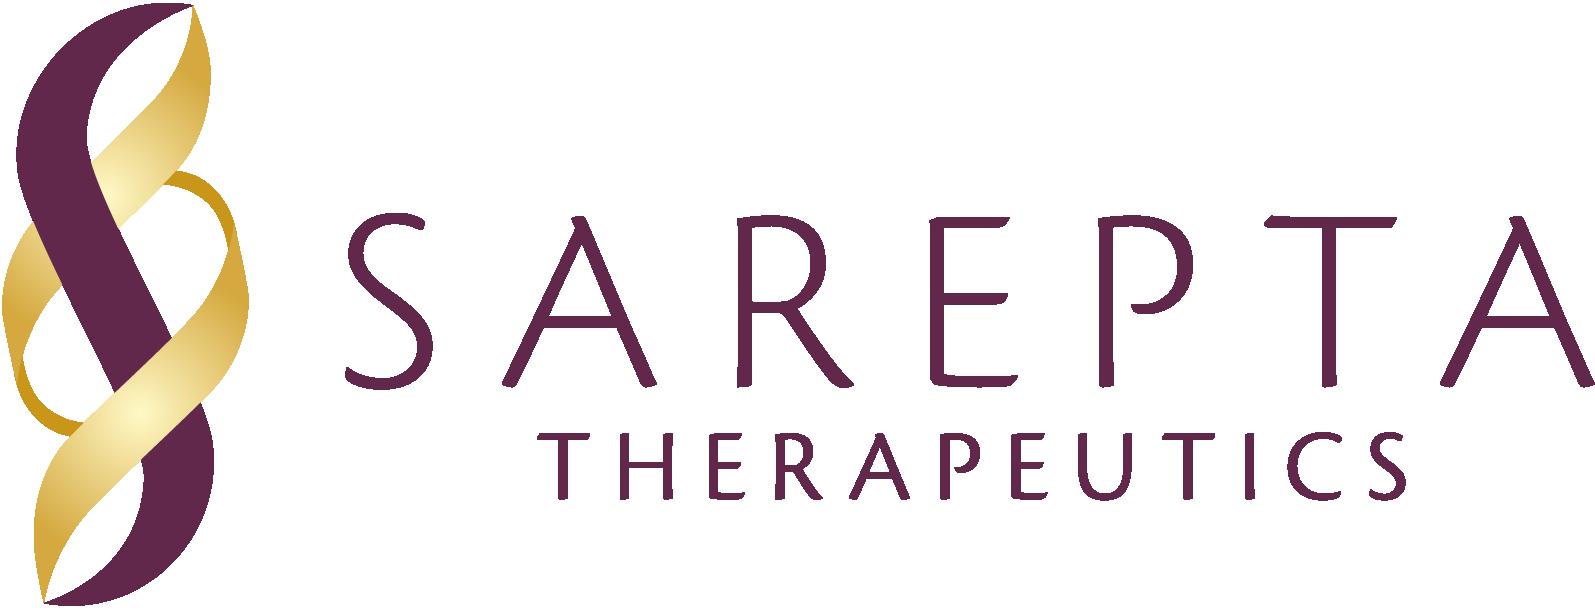 Sarepta Therapeutics Logo png